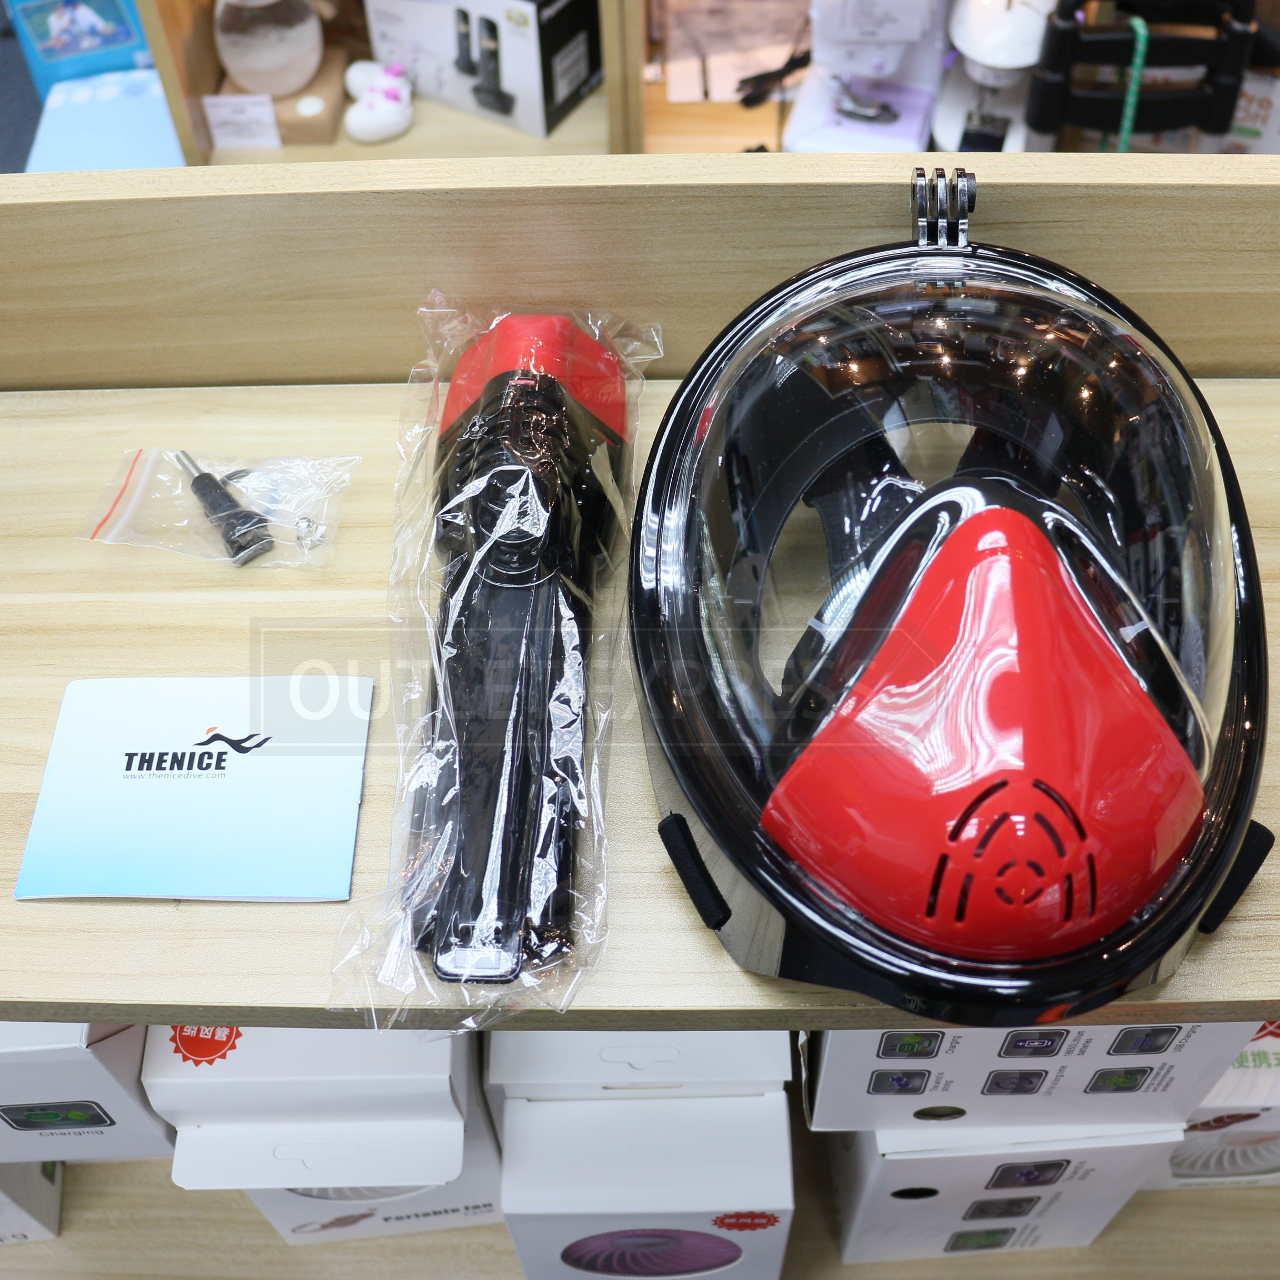 THENICE全乾式防霧浮潛面罩及包裝配件- Outlet Express HK生活百貨城實拍相片